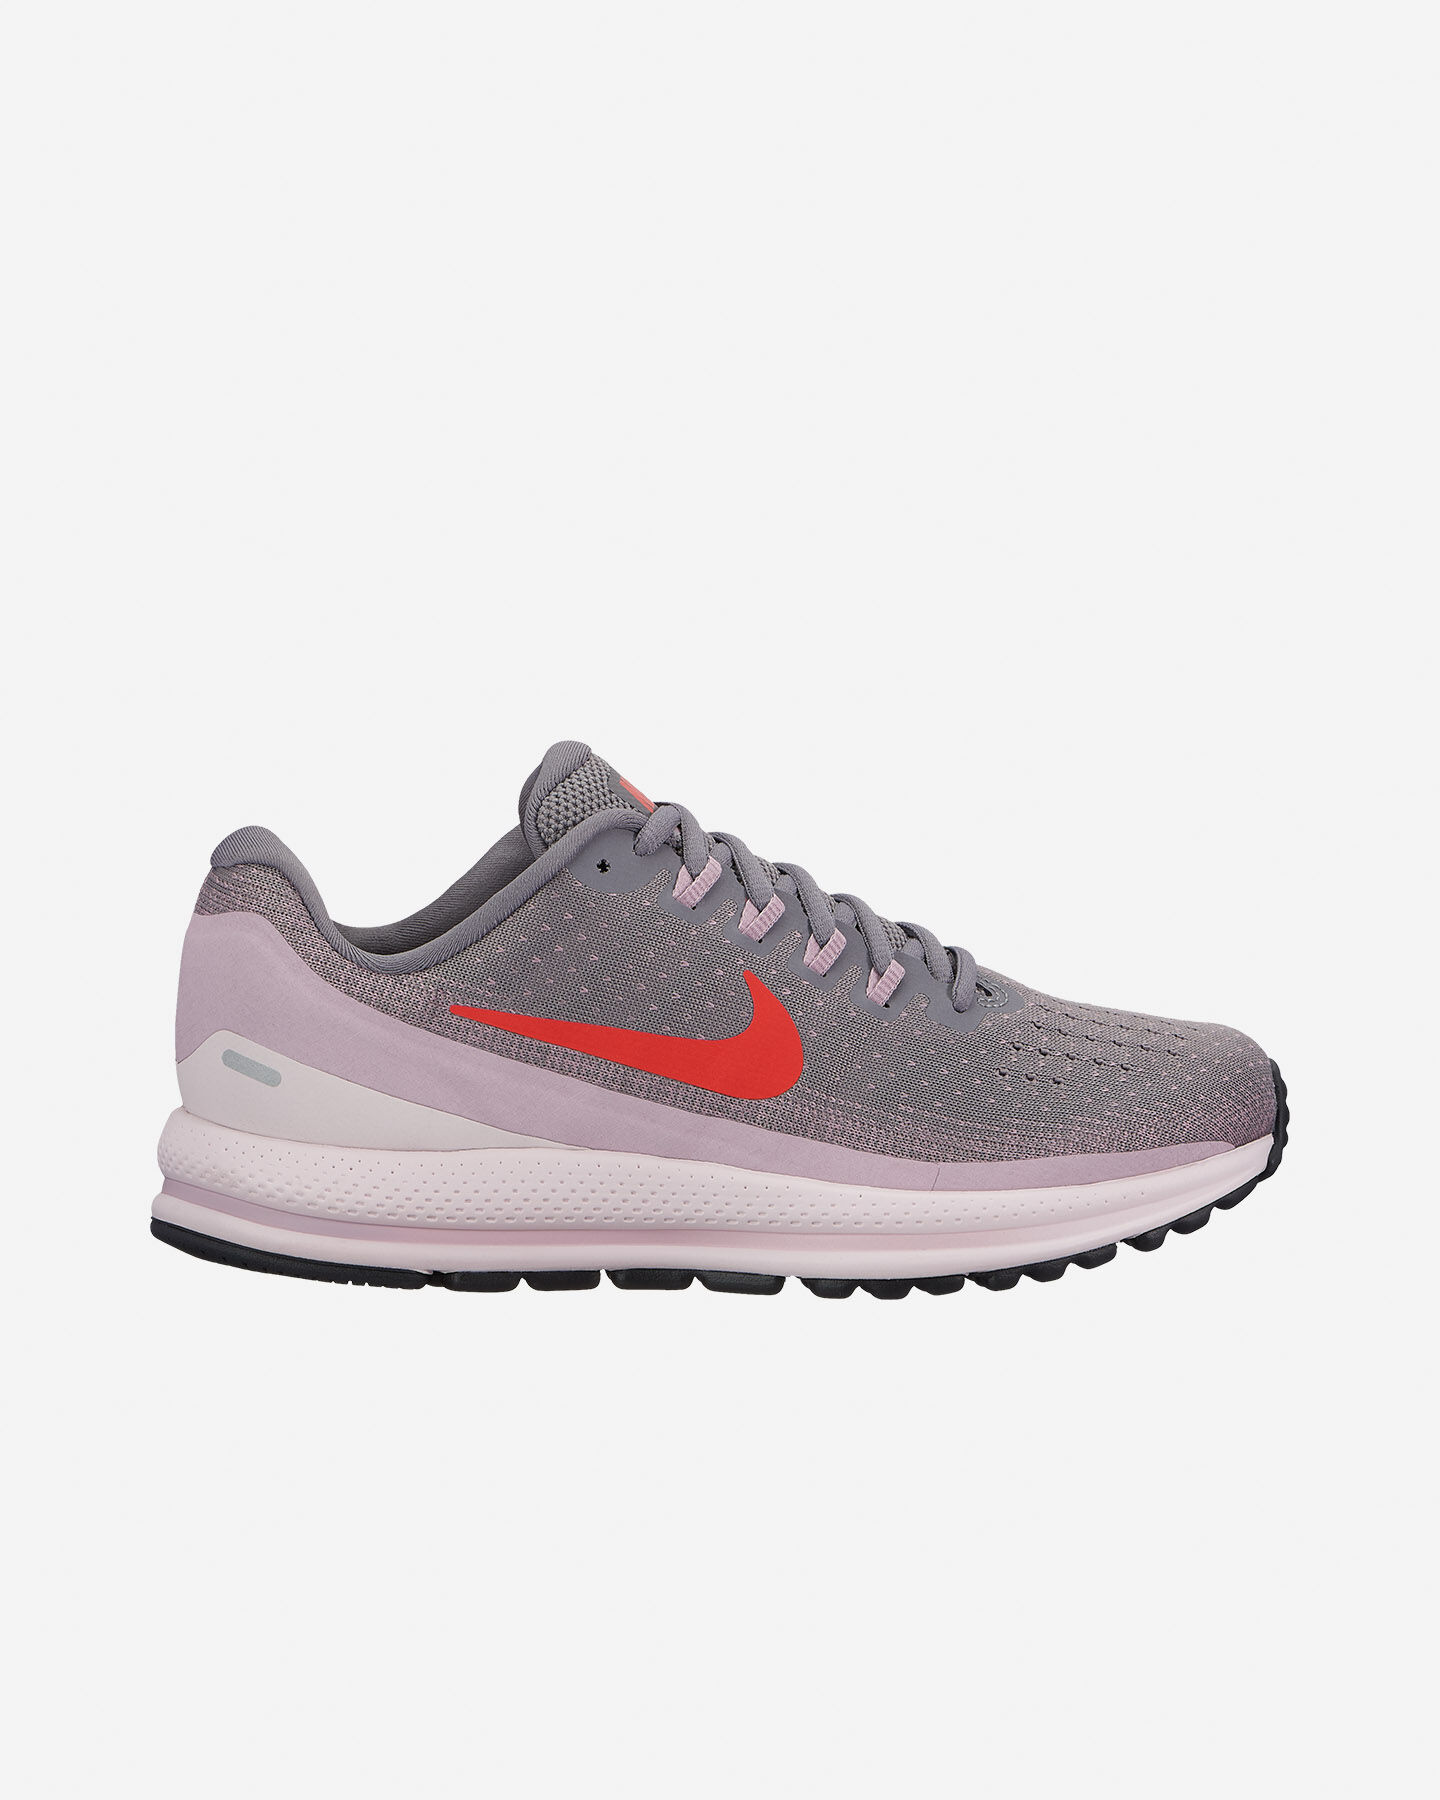 Nike Nike Nike Zoom Vomero 13 W 922909 004   Scarpe In esecuzione su Cisalfa Sport 4dc91d